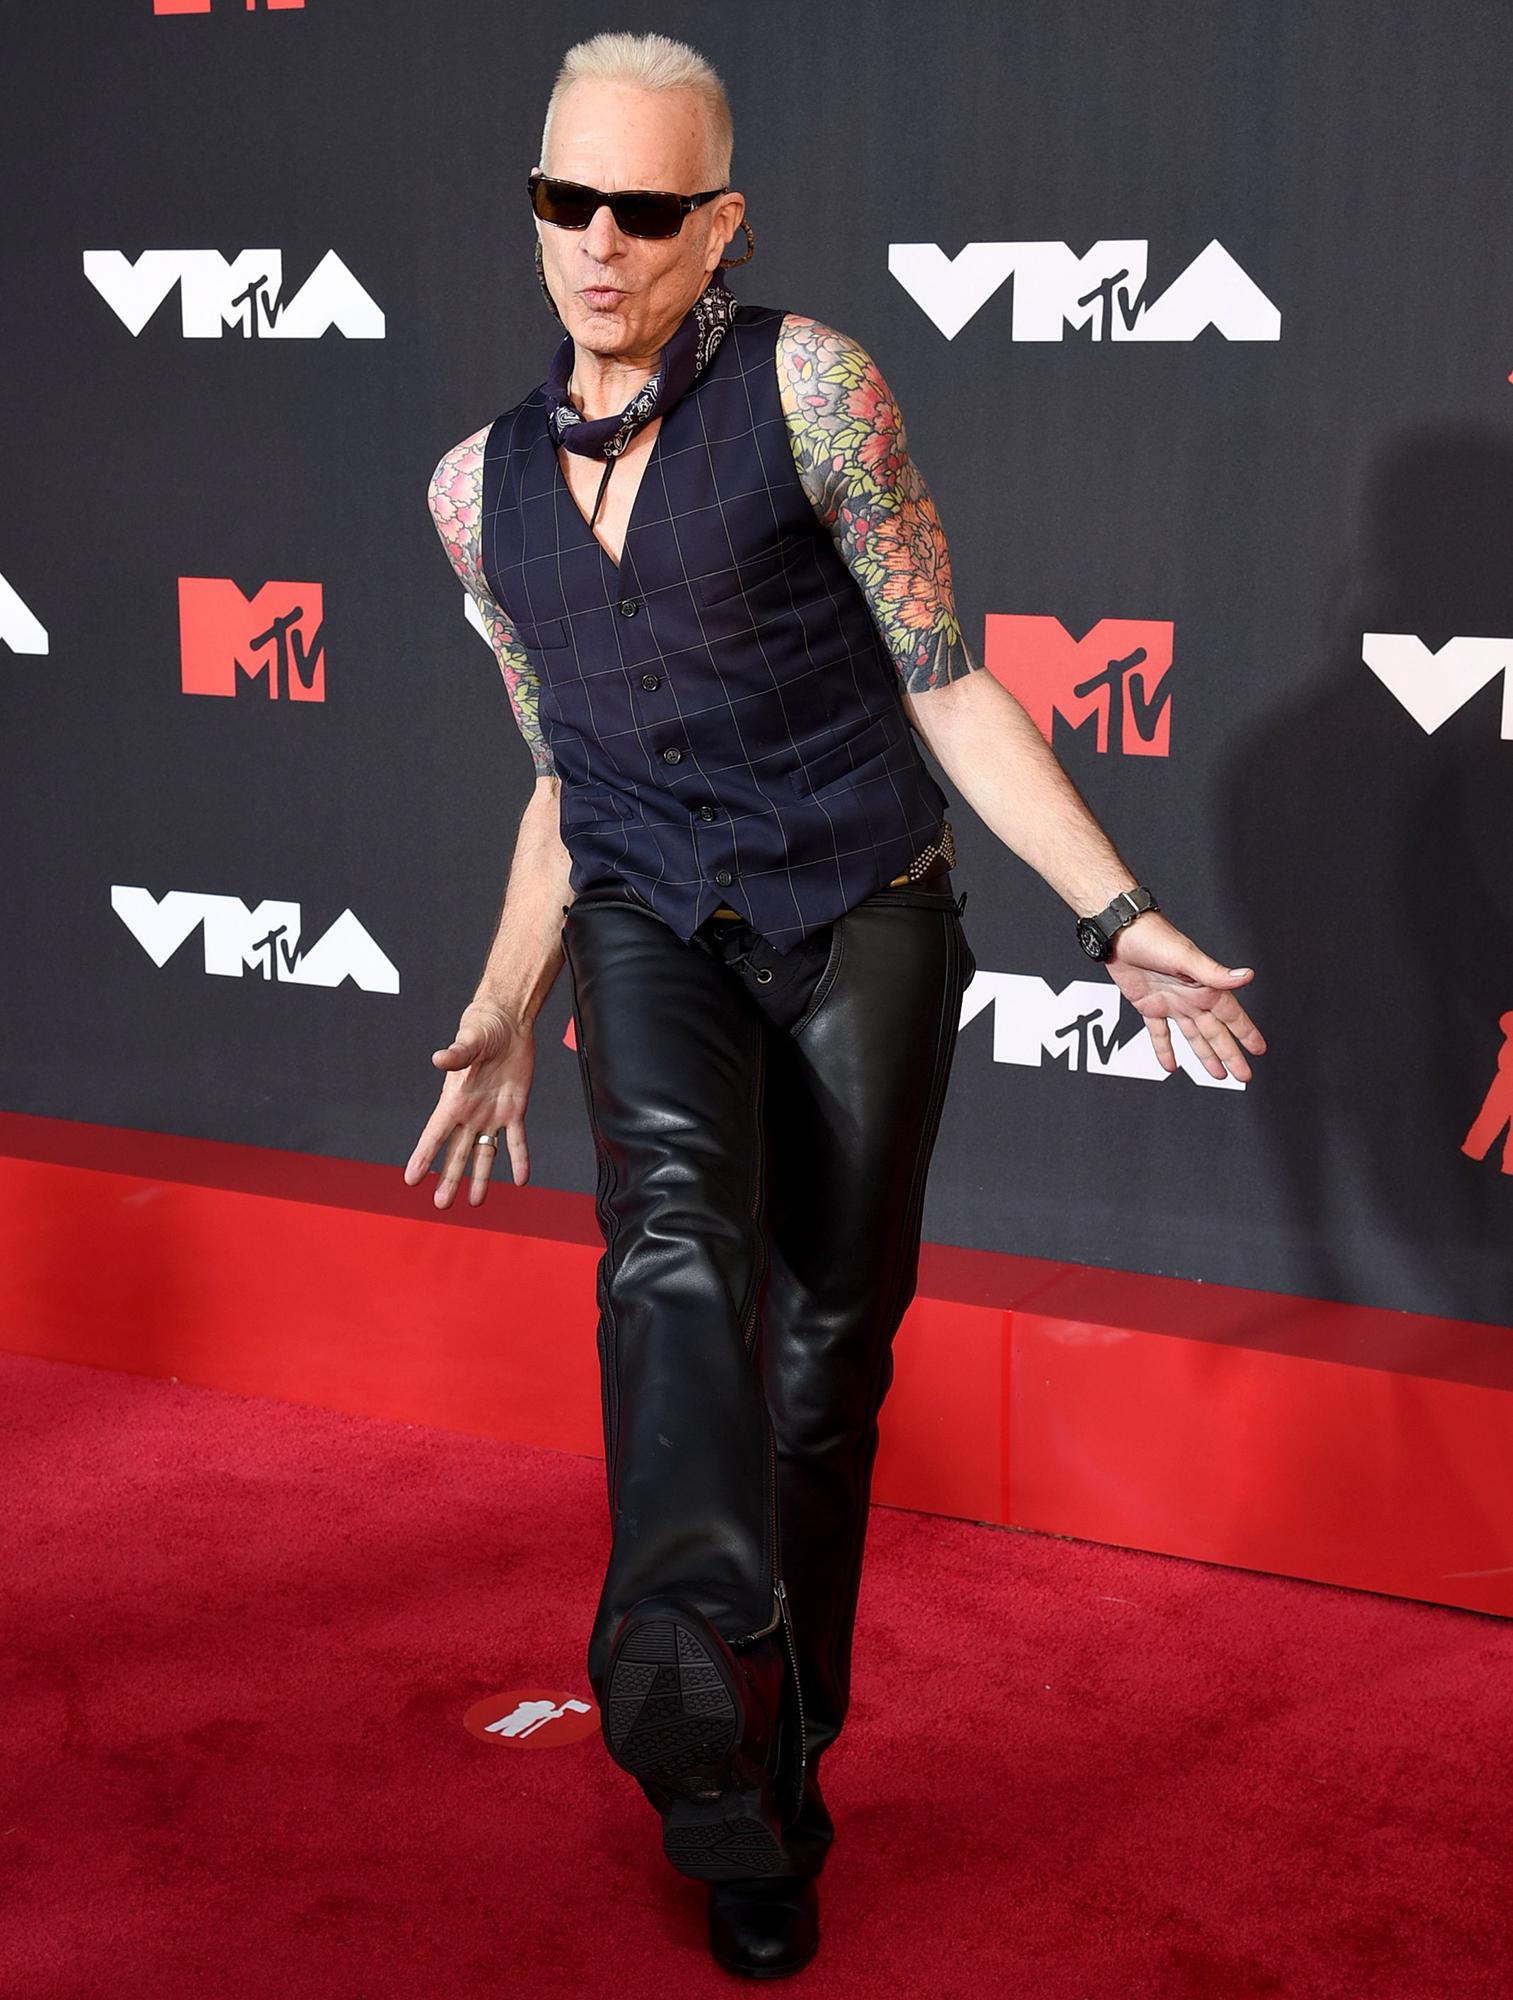 David Lee Roth arrives at the 2021 MTV Video Music Awards